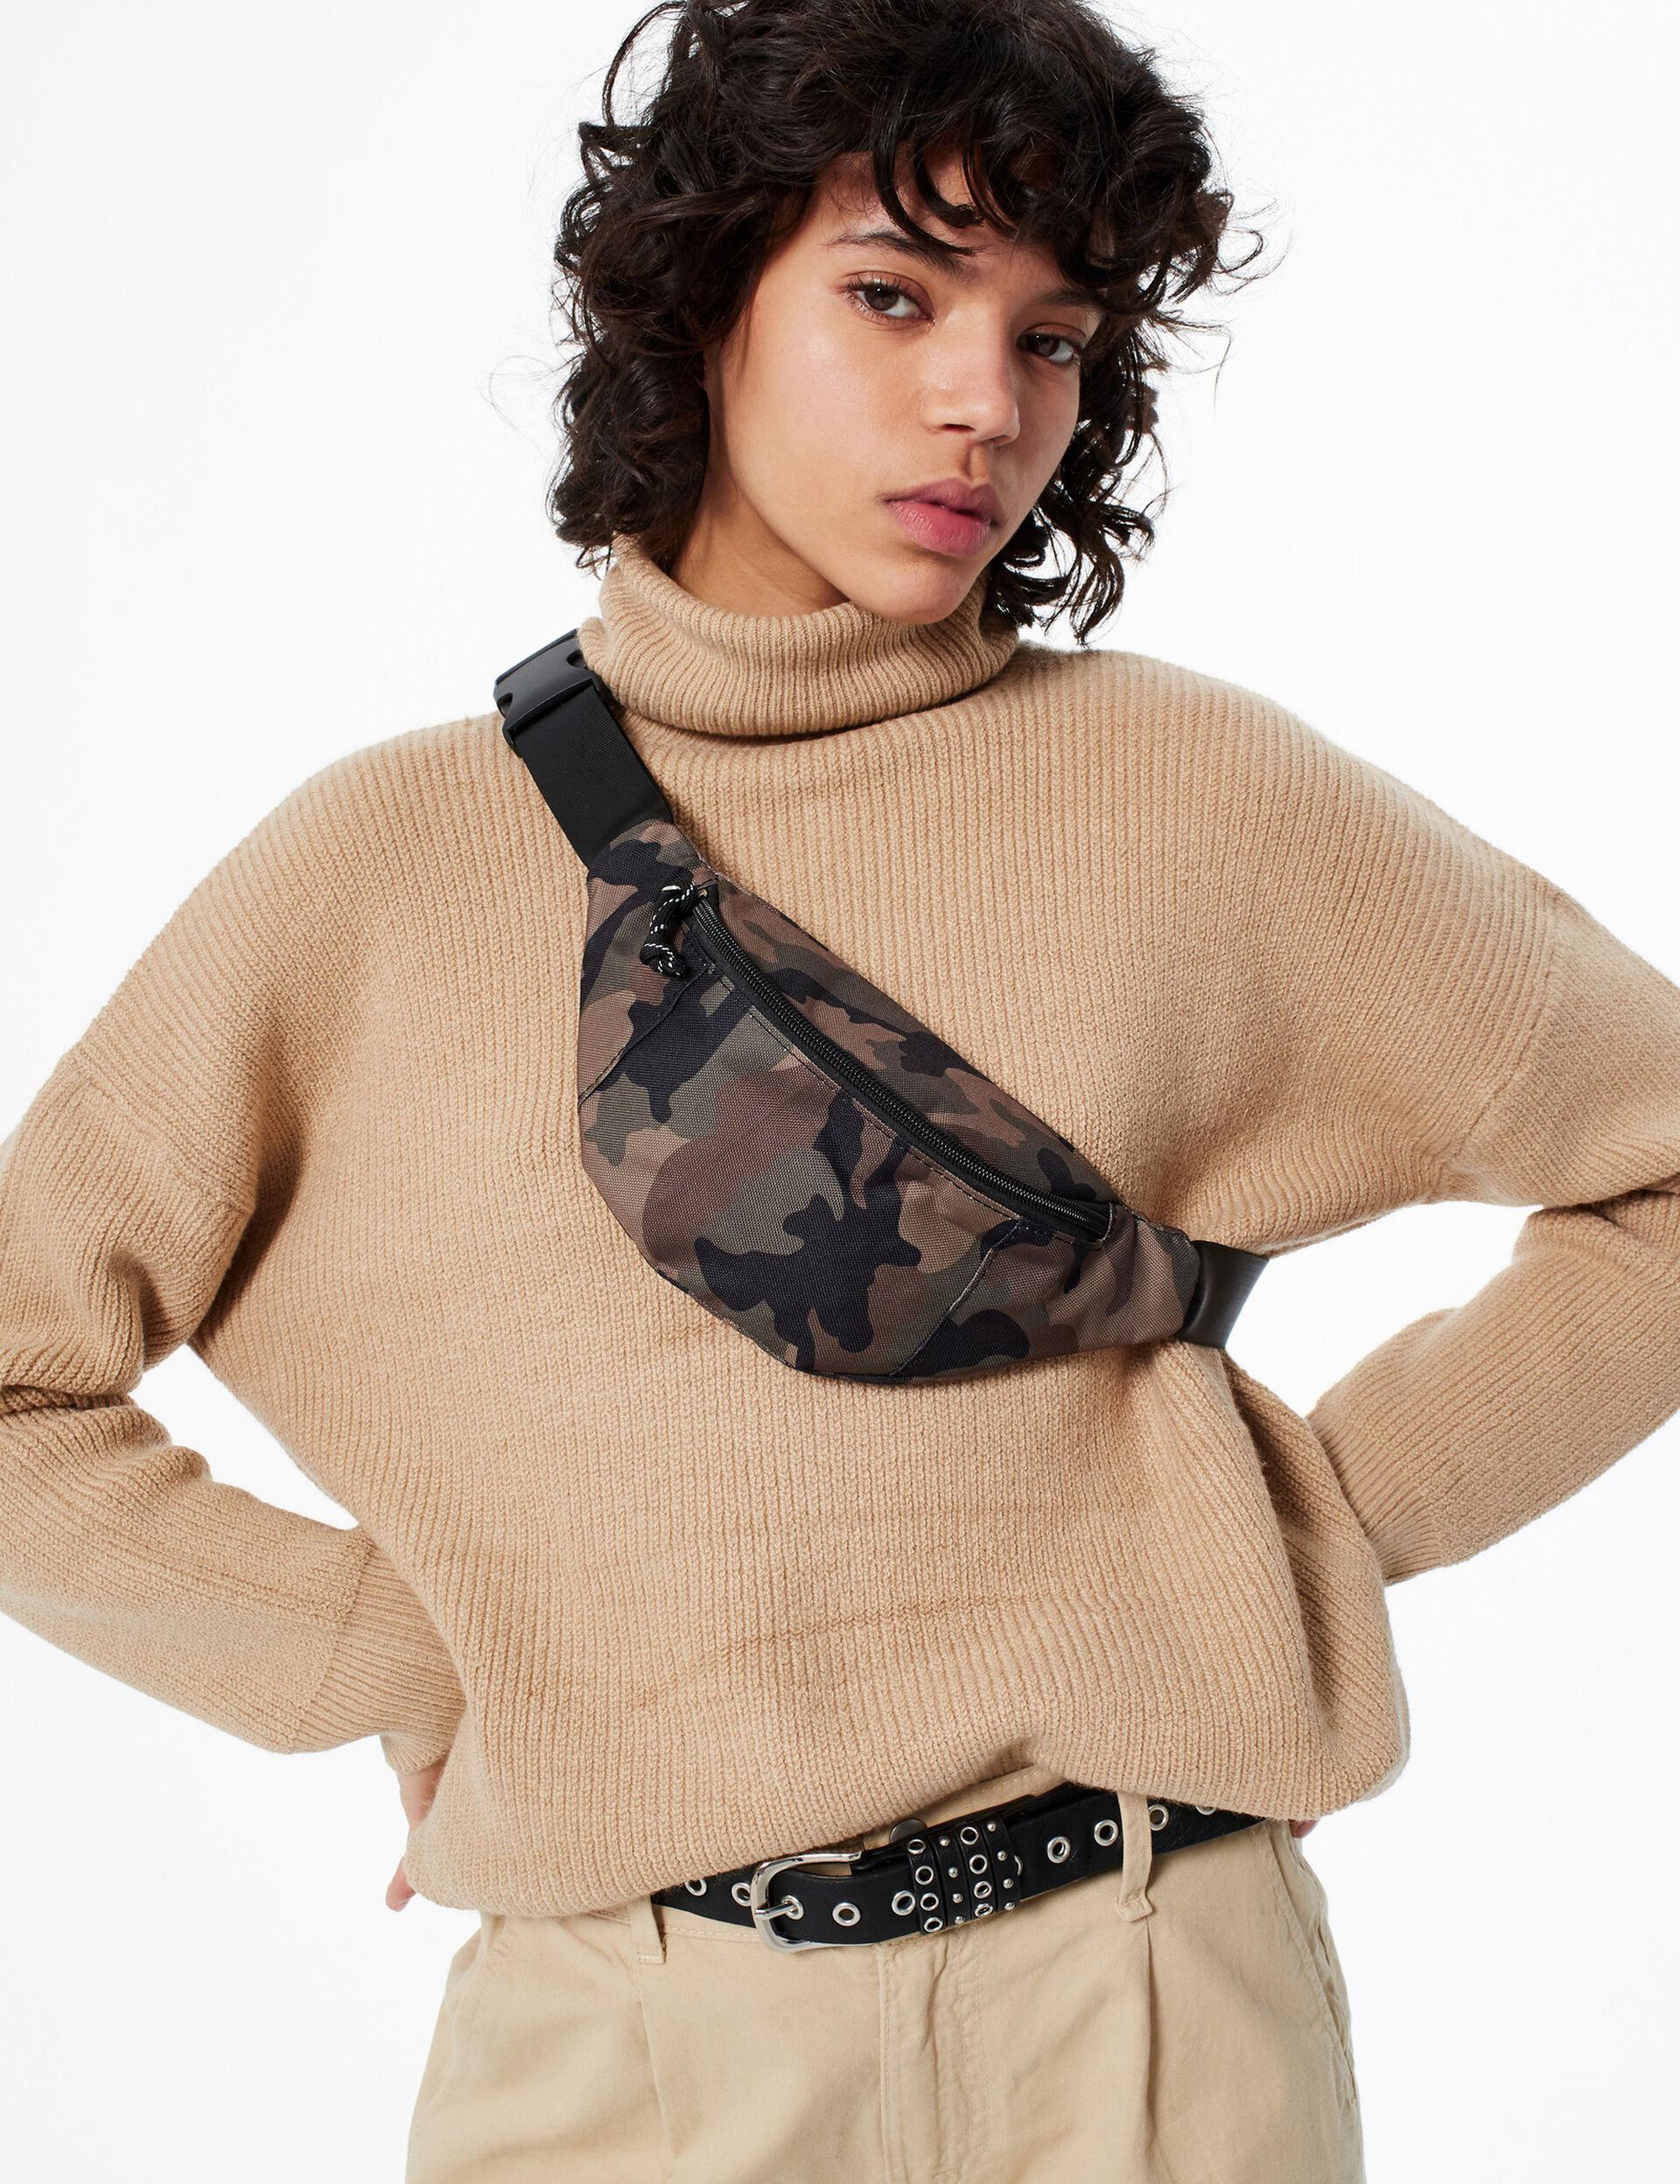 Camouflage bumbag